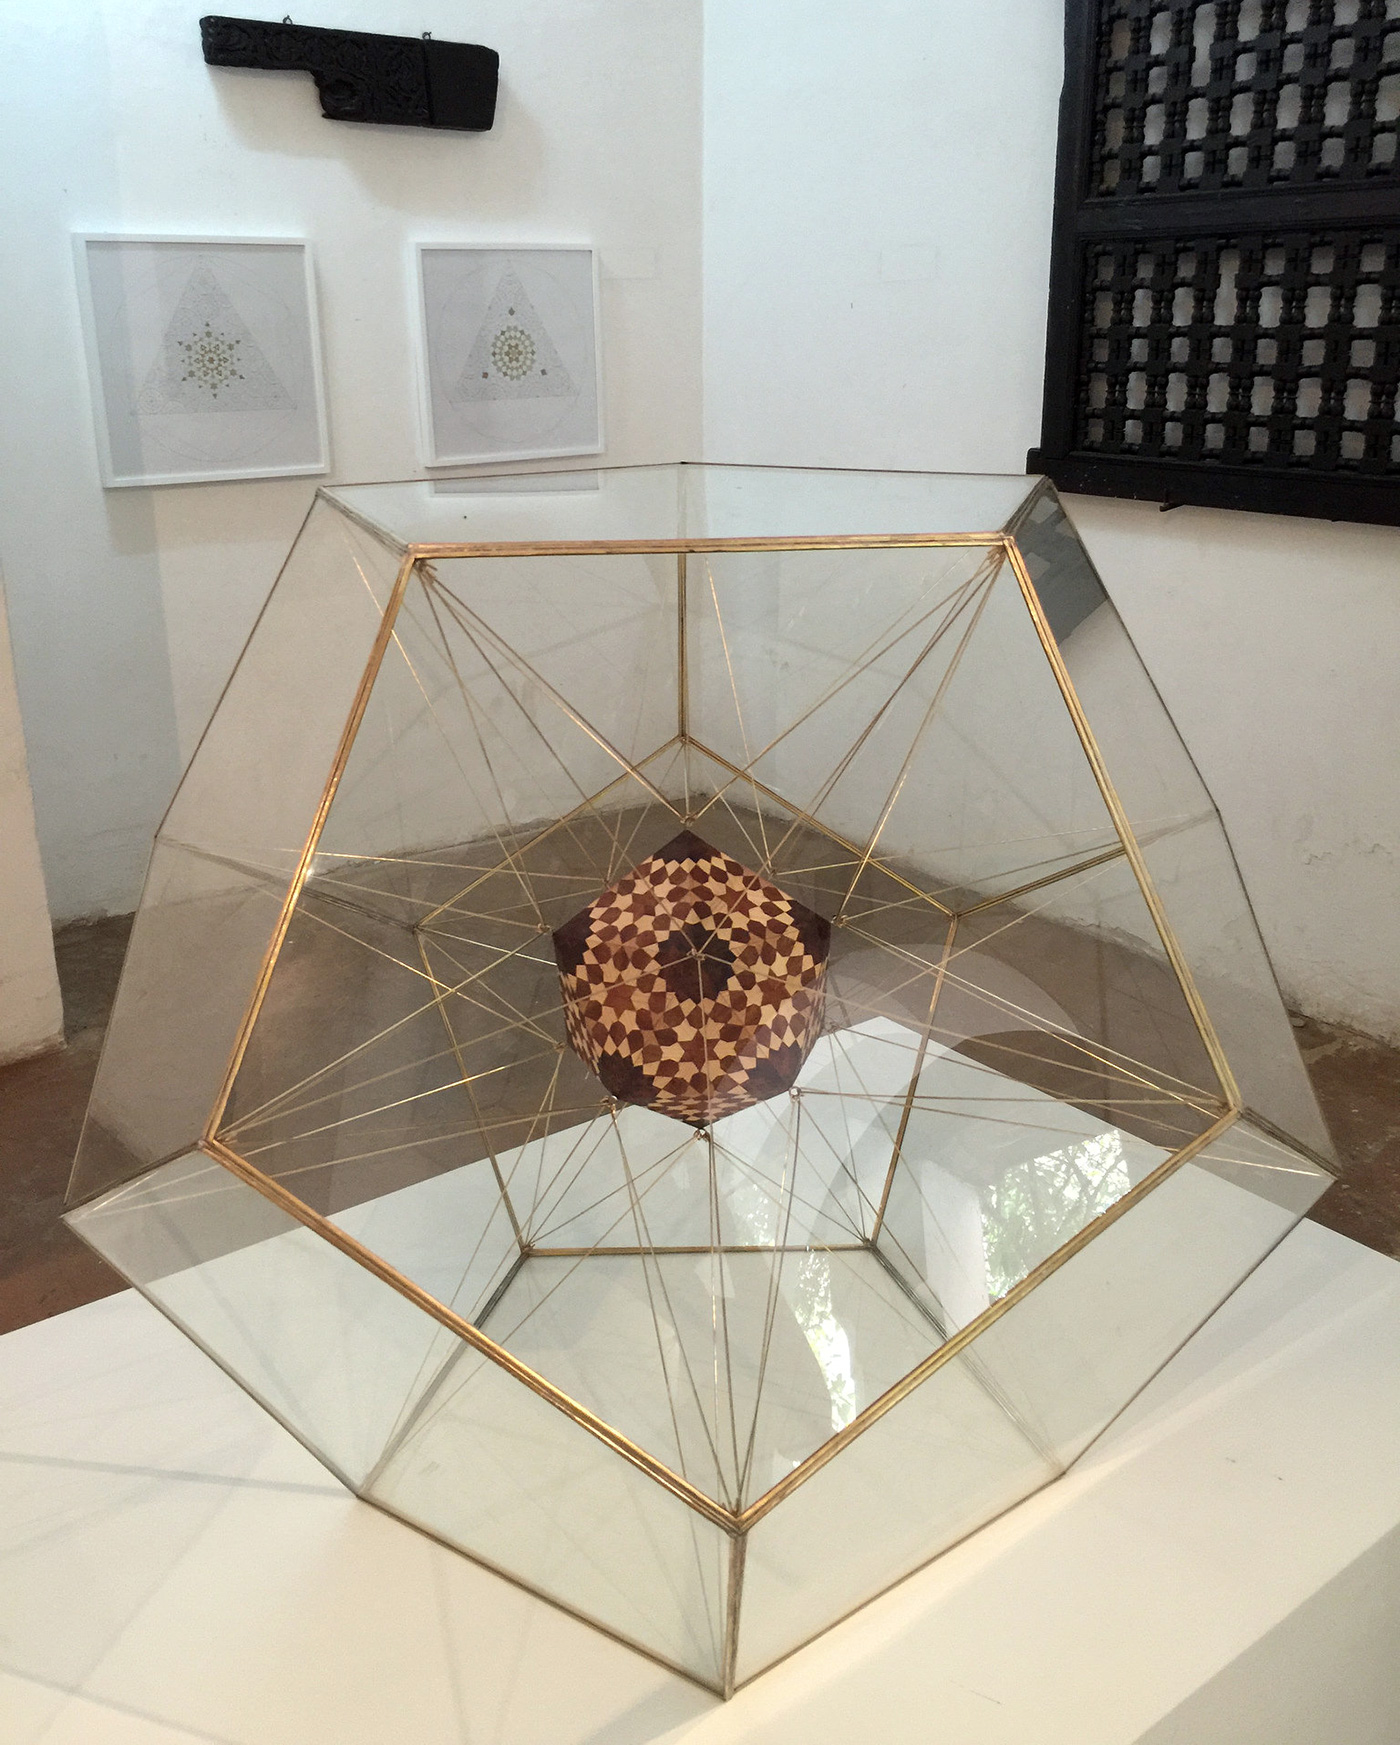 Art by Dana Awartani explores mathematical concepts